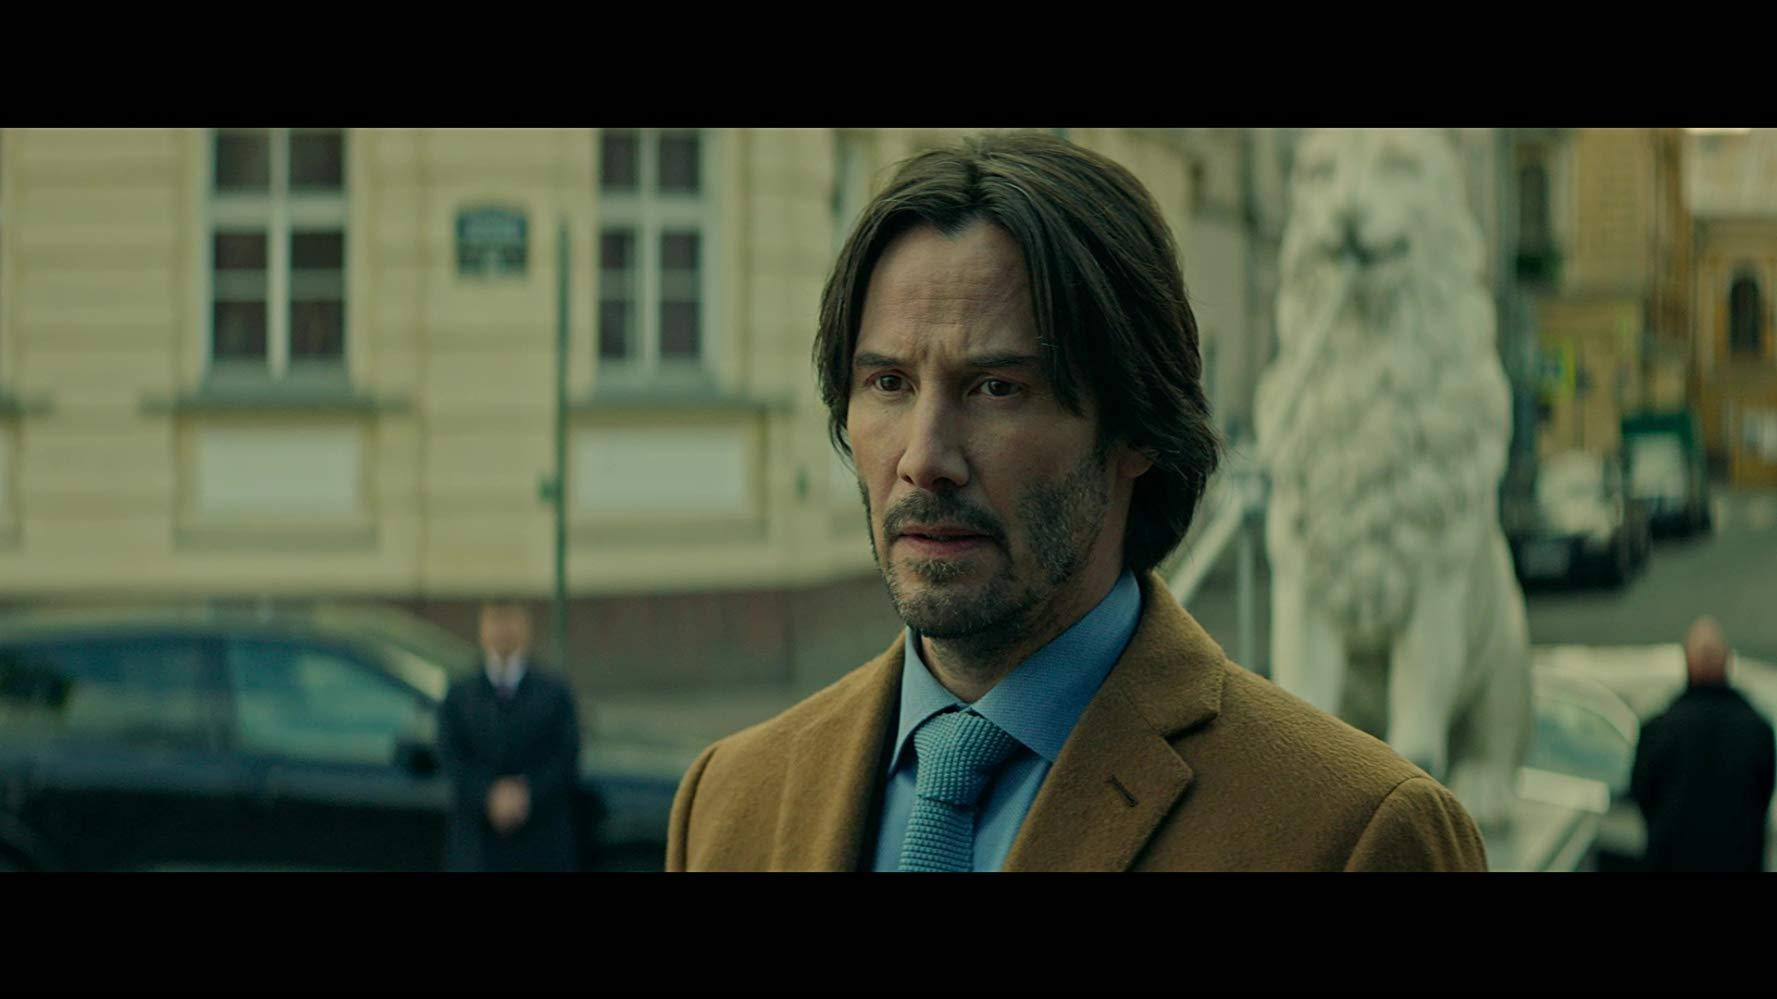 مشاهدة فيلم Siberia 2018 HD مترجم كامل اون لاين